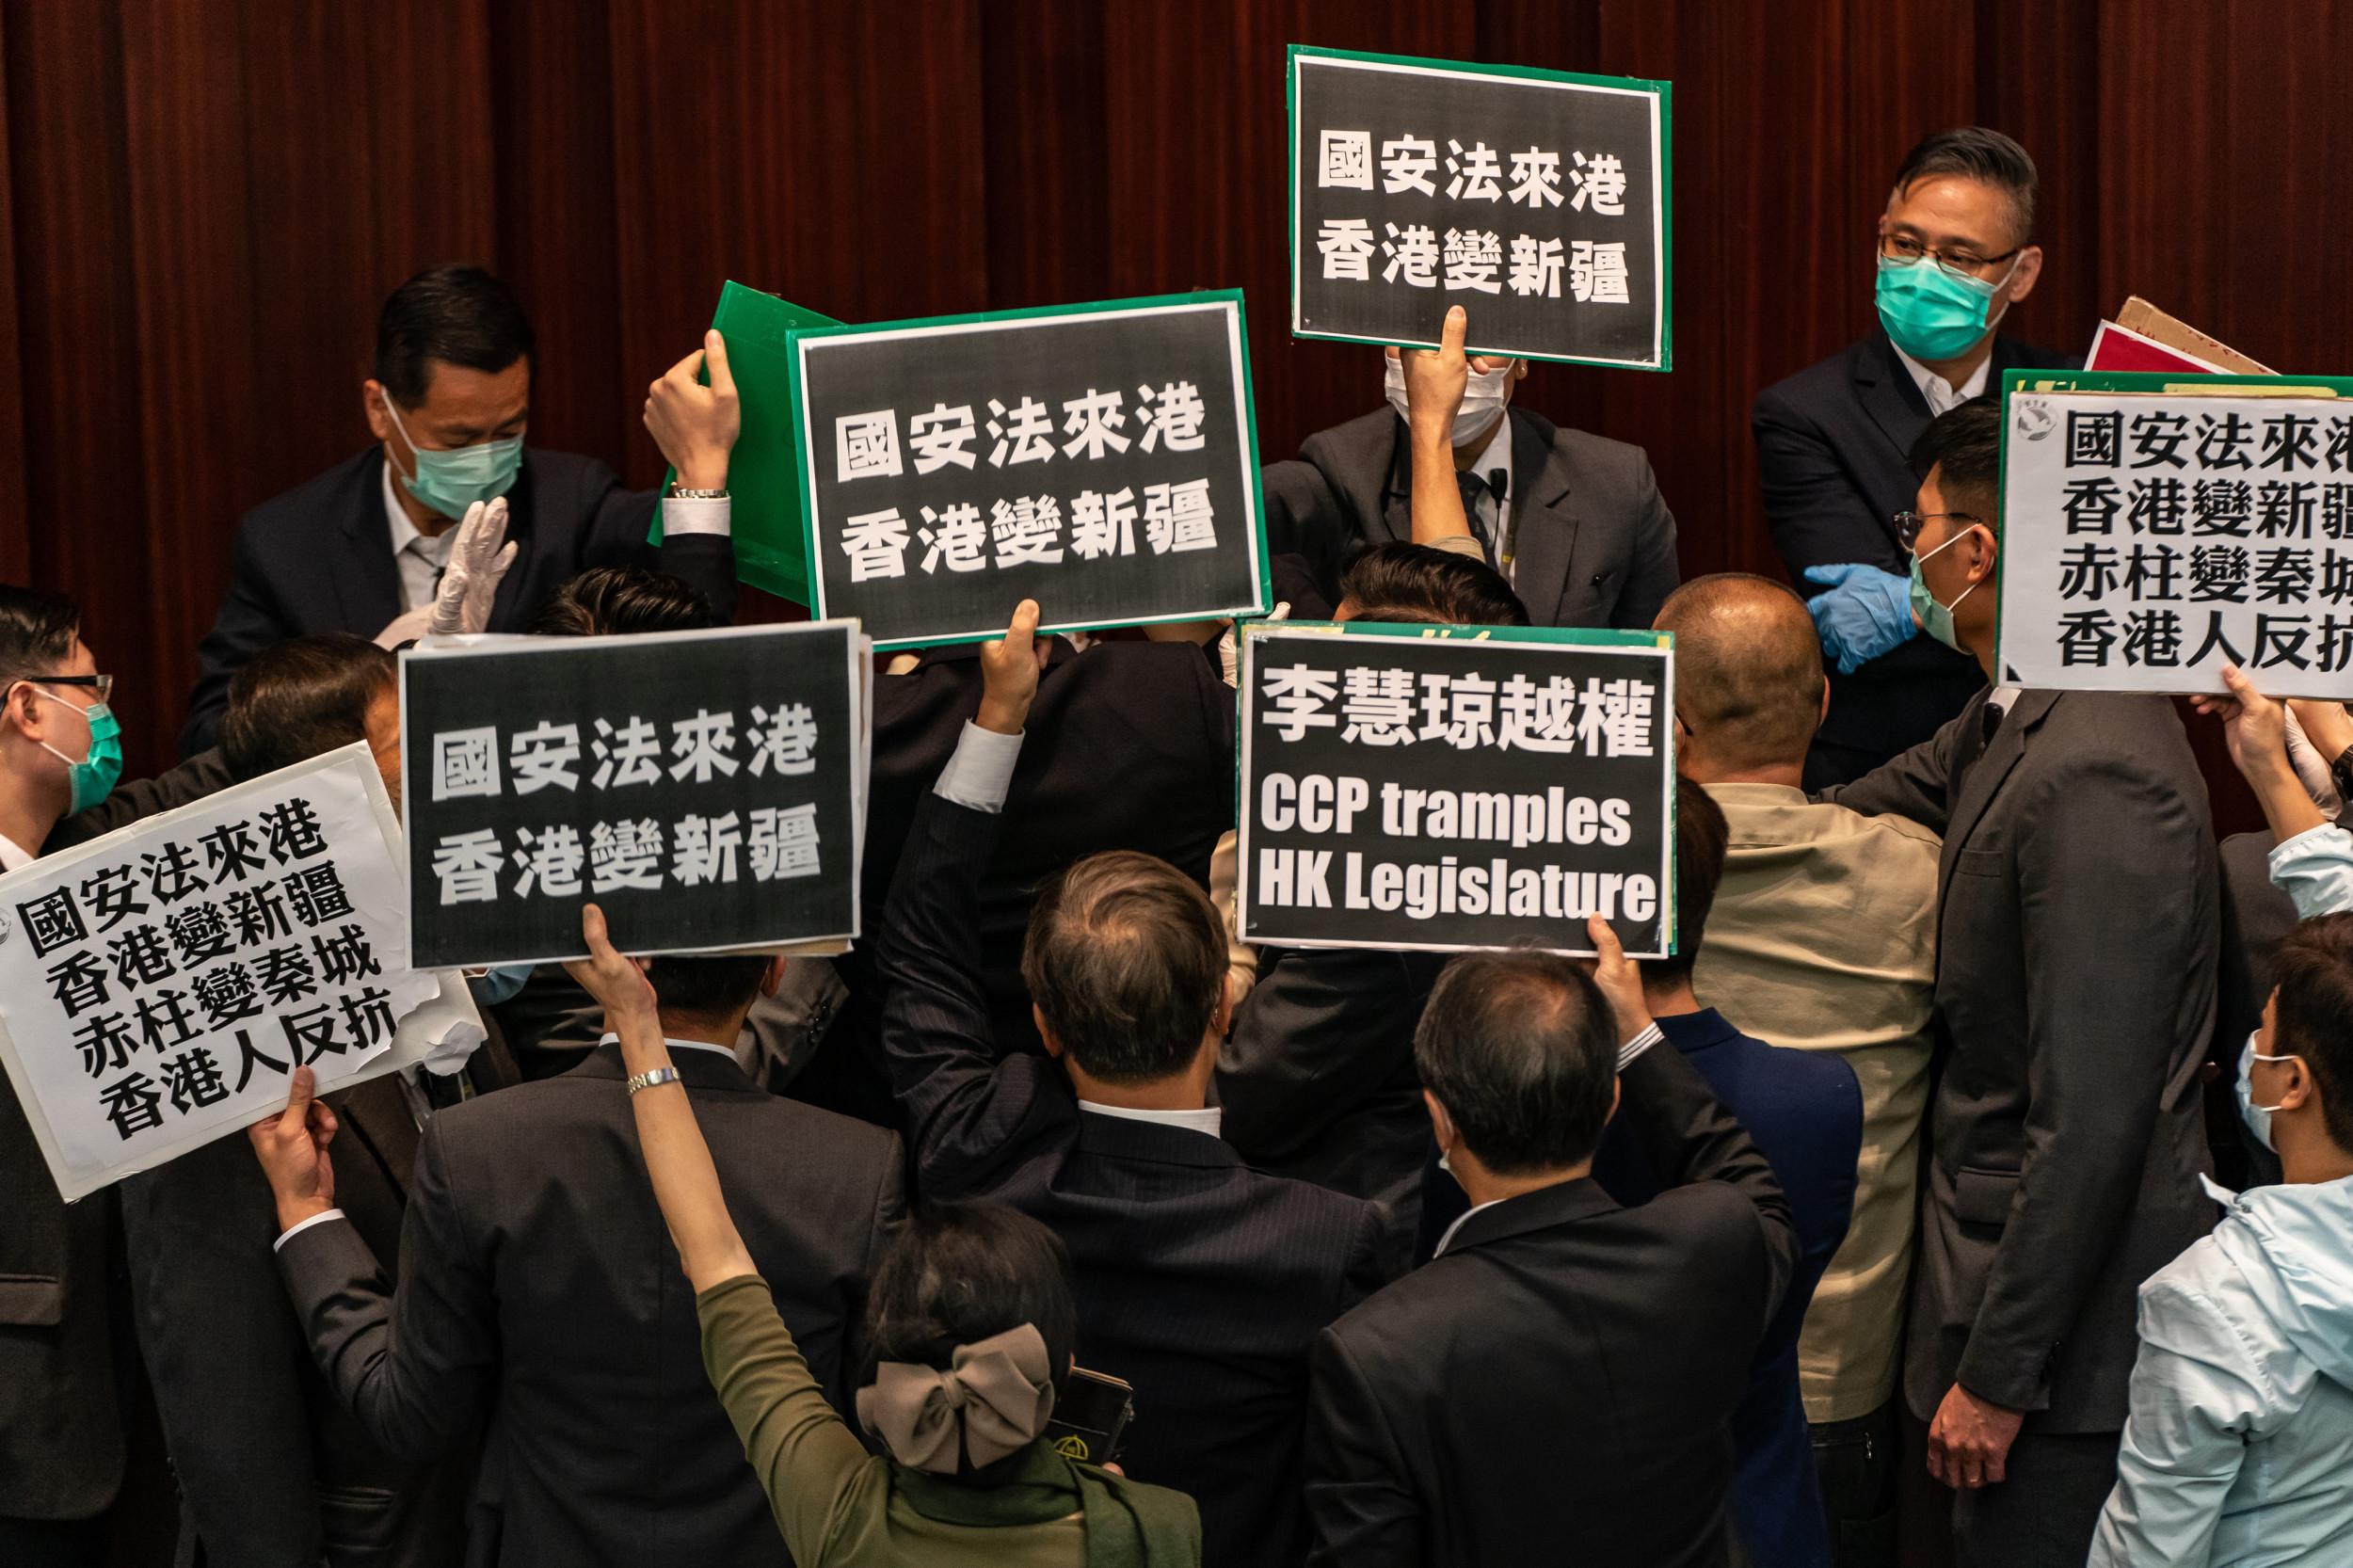 China will fight back if U.S. intervenes in Hong Kong, Beijing warns